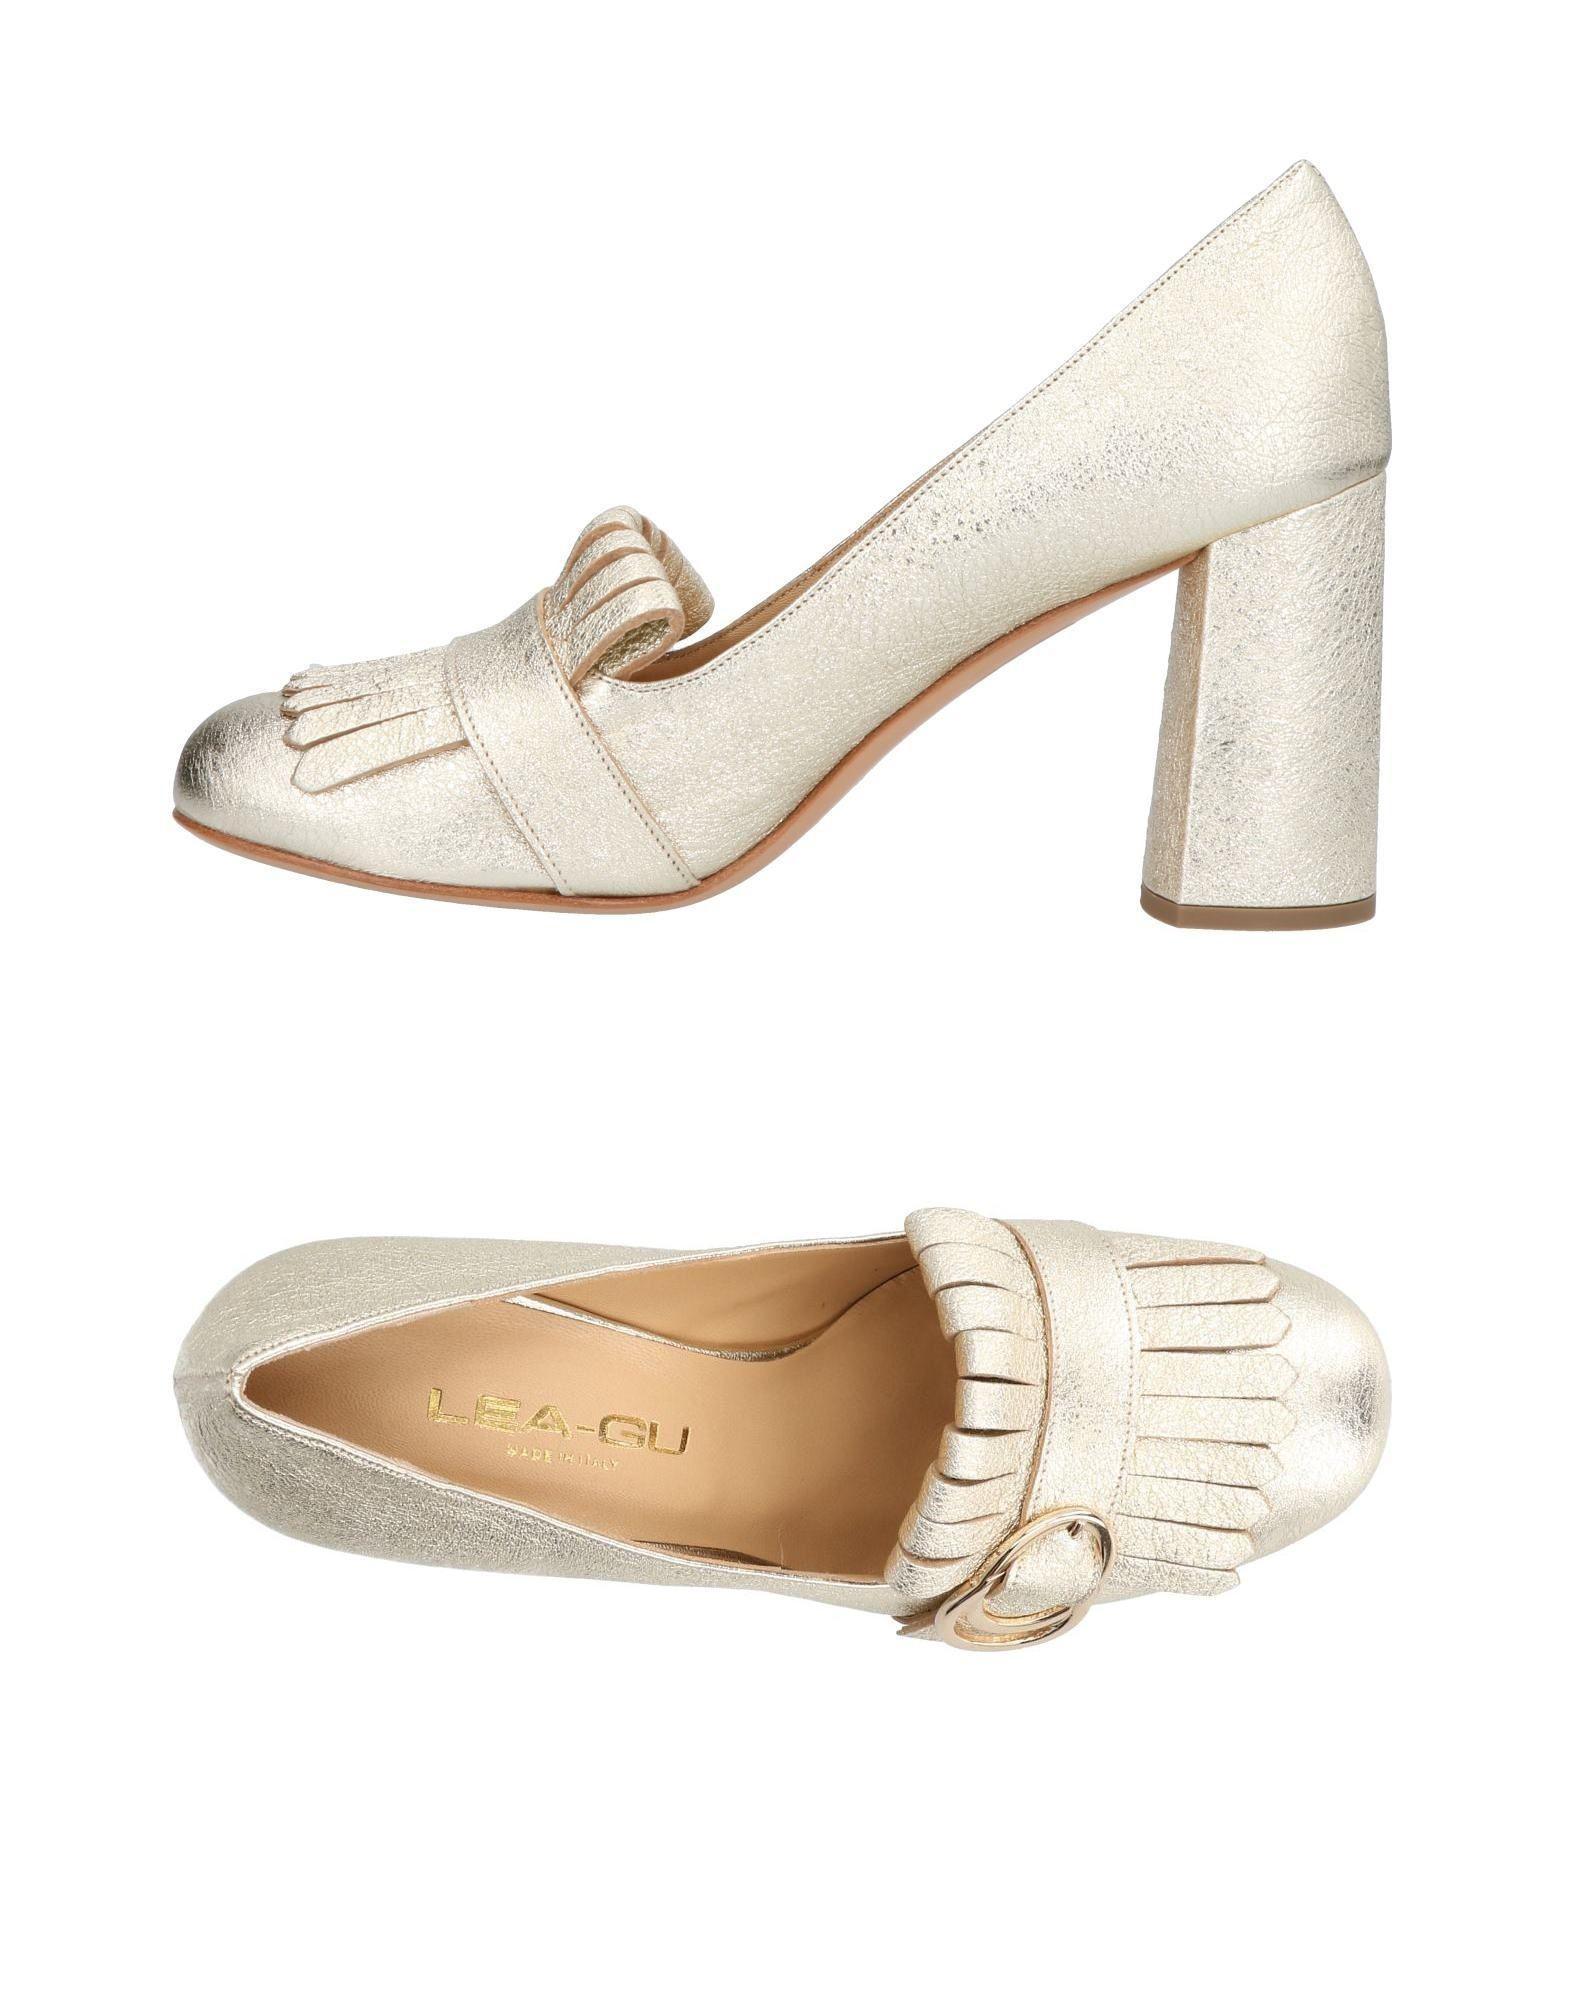 FOOTWEAR - Courts Lea-Gu Q79B1T7D